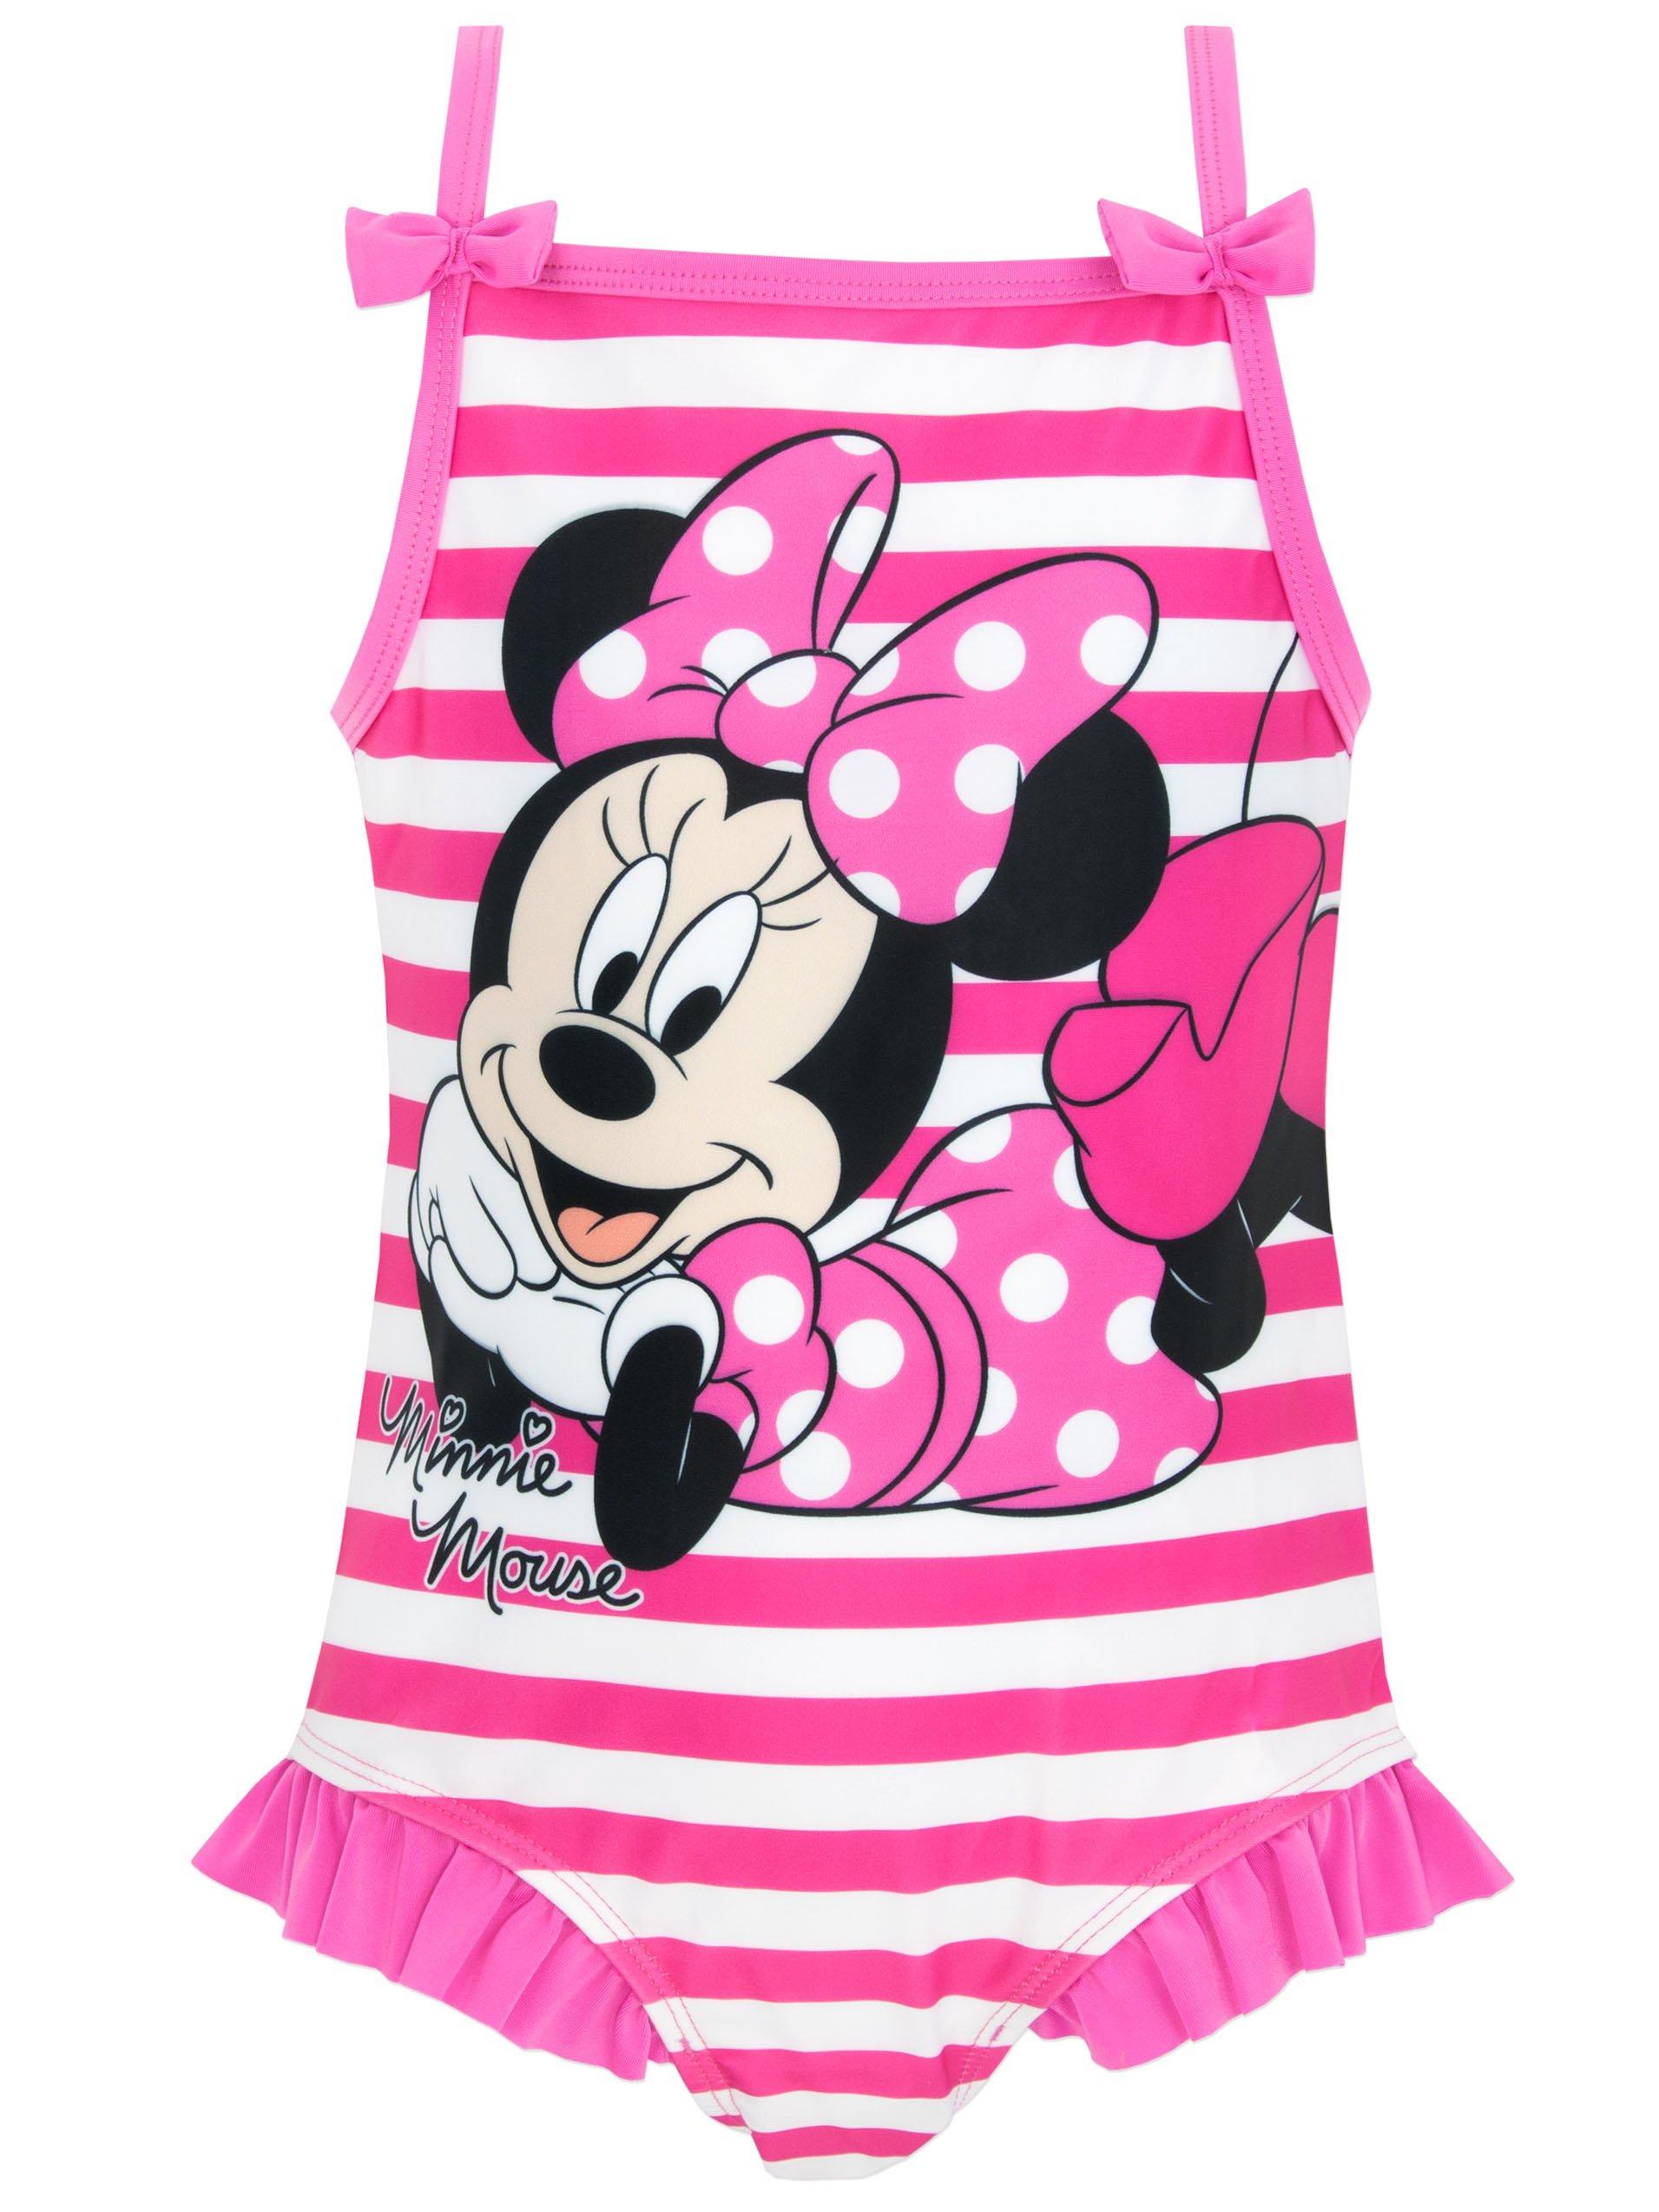 Disney Minnie Mouse - Bañador para niña Minnie Mouse product image